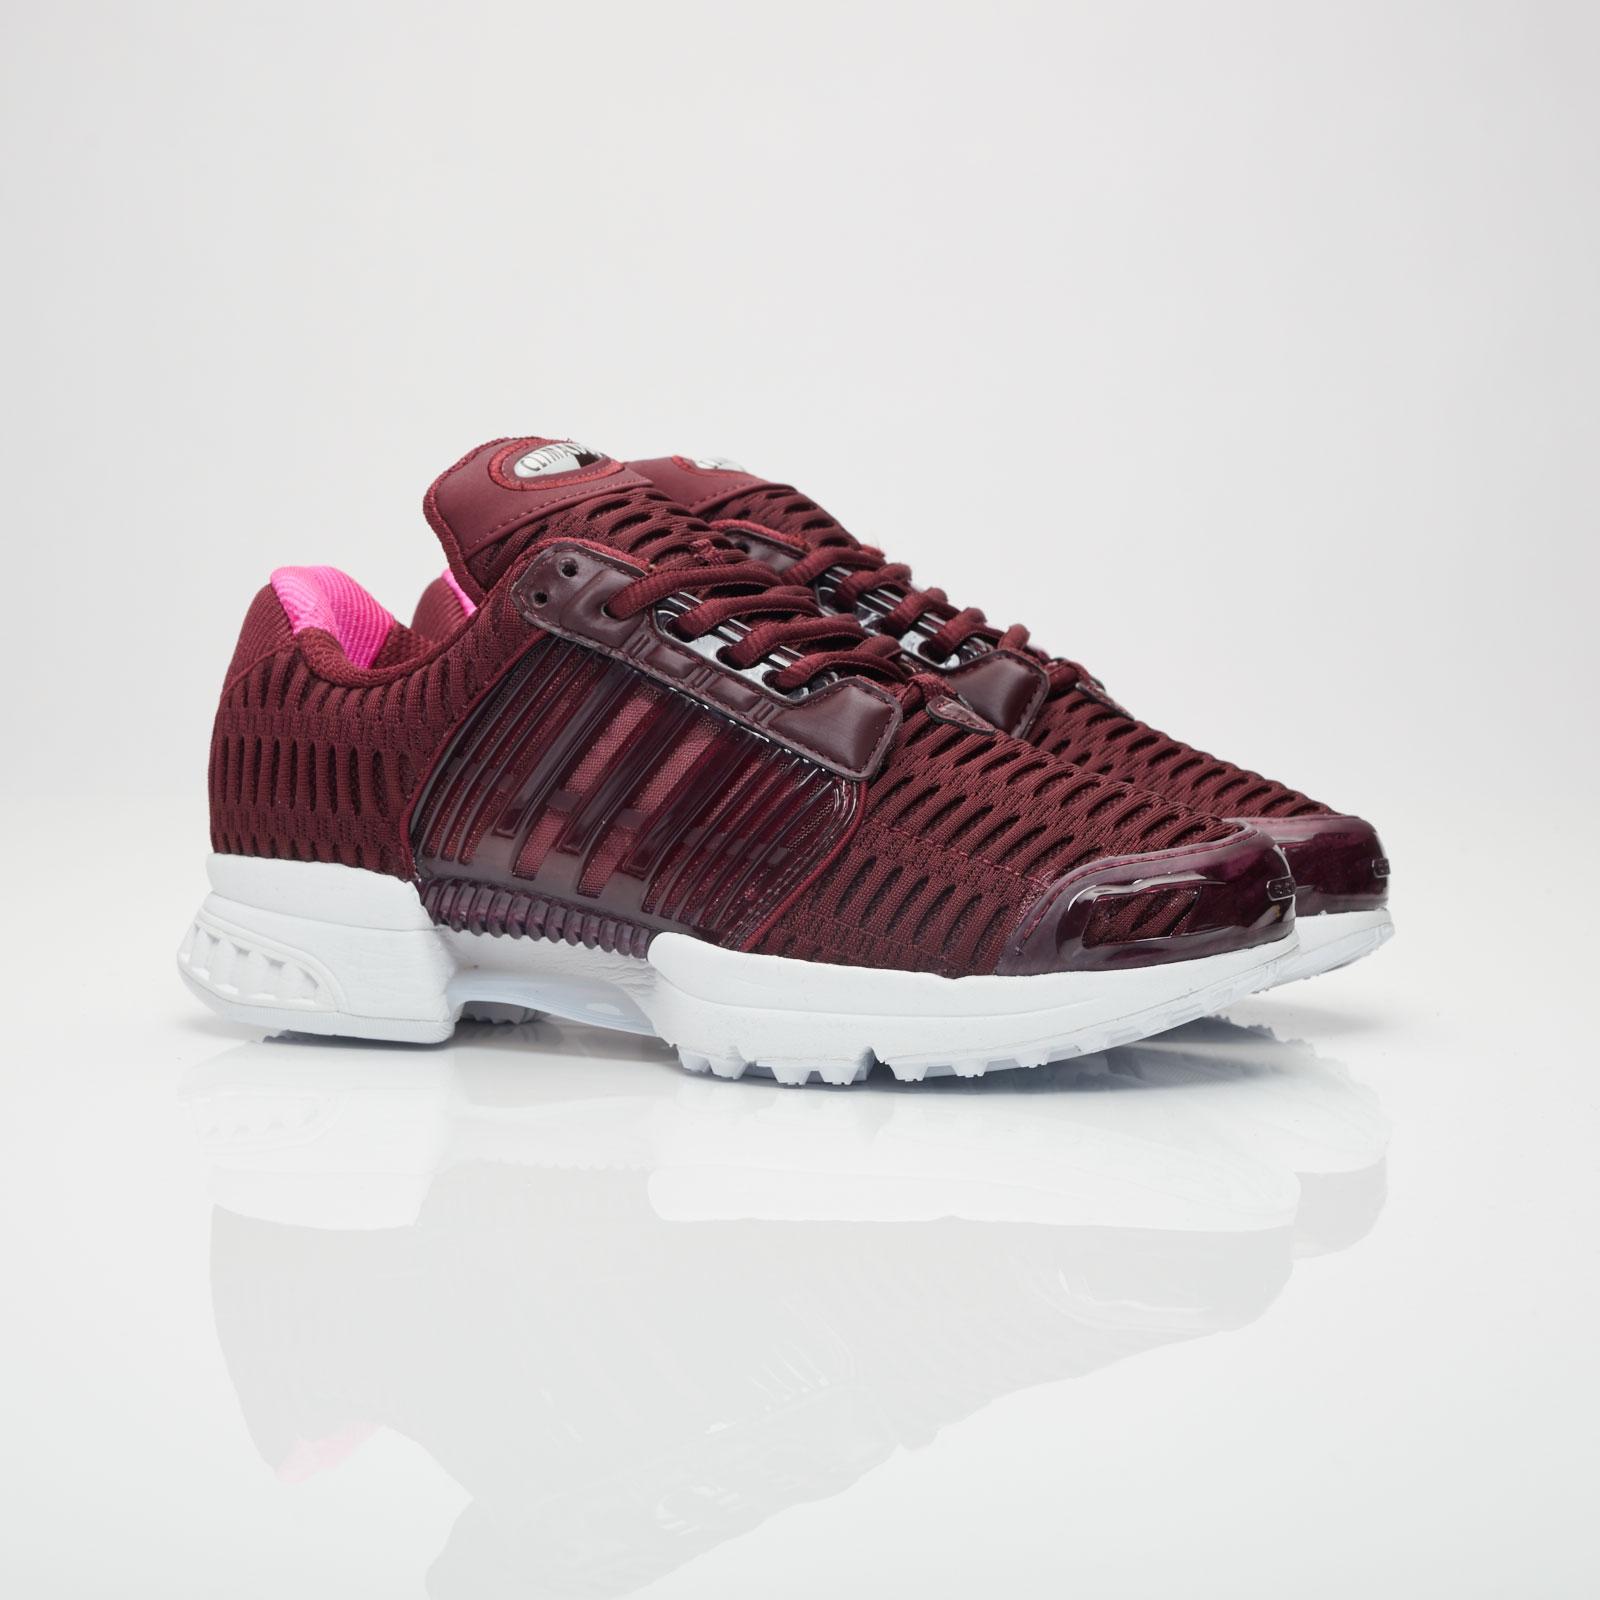 fce43ced1aff90 adidas Climacool 1 W - Bb5302 - Sneakersnstuff